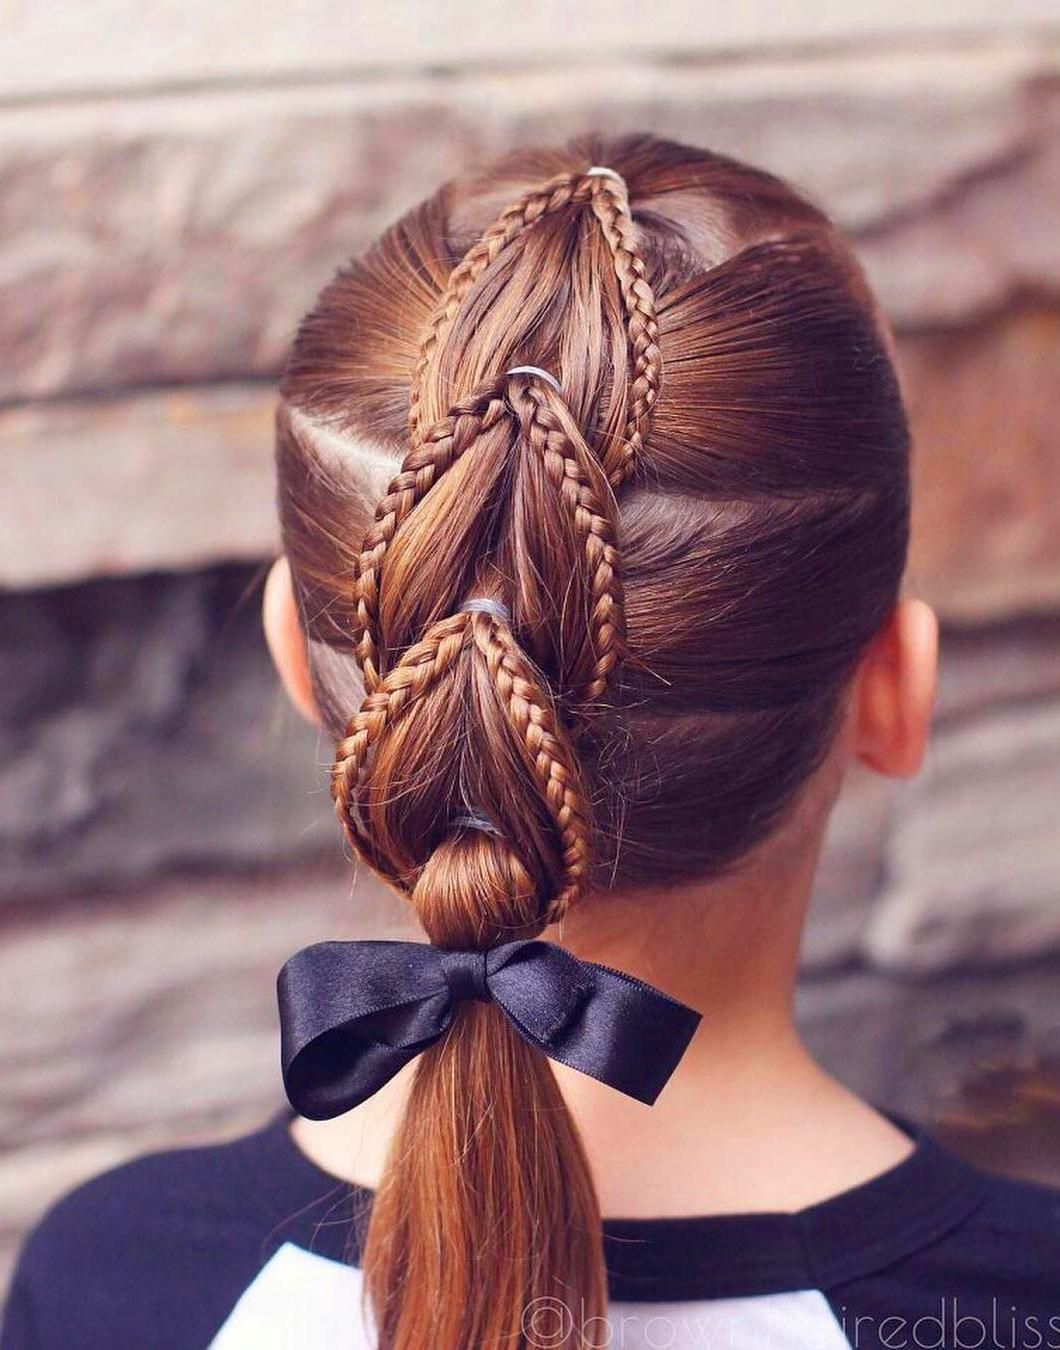 Elegant Prom Updo Wedding Hairstyles For Medium Length Hair Flippedcase - Hair Beauty